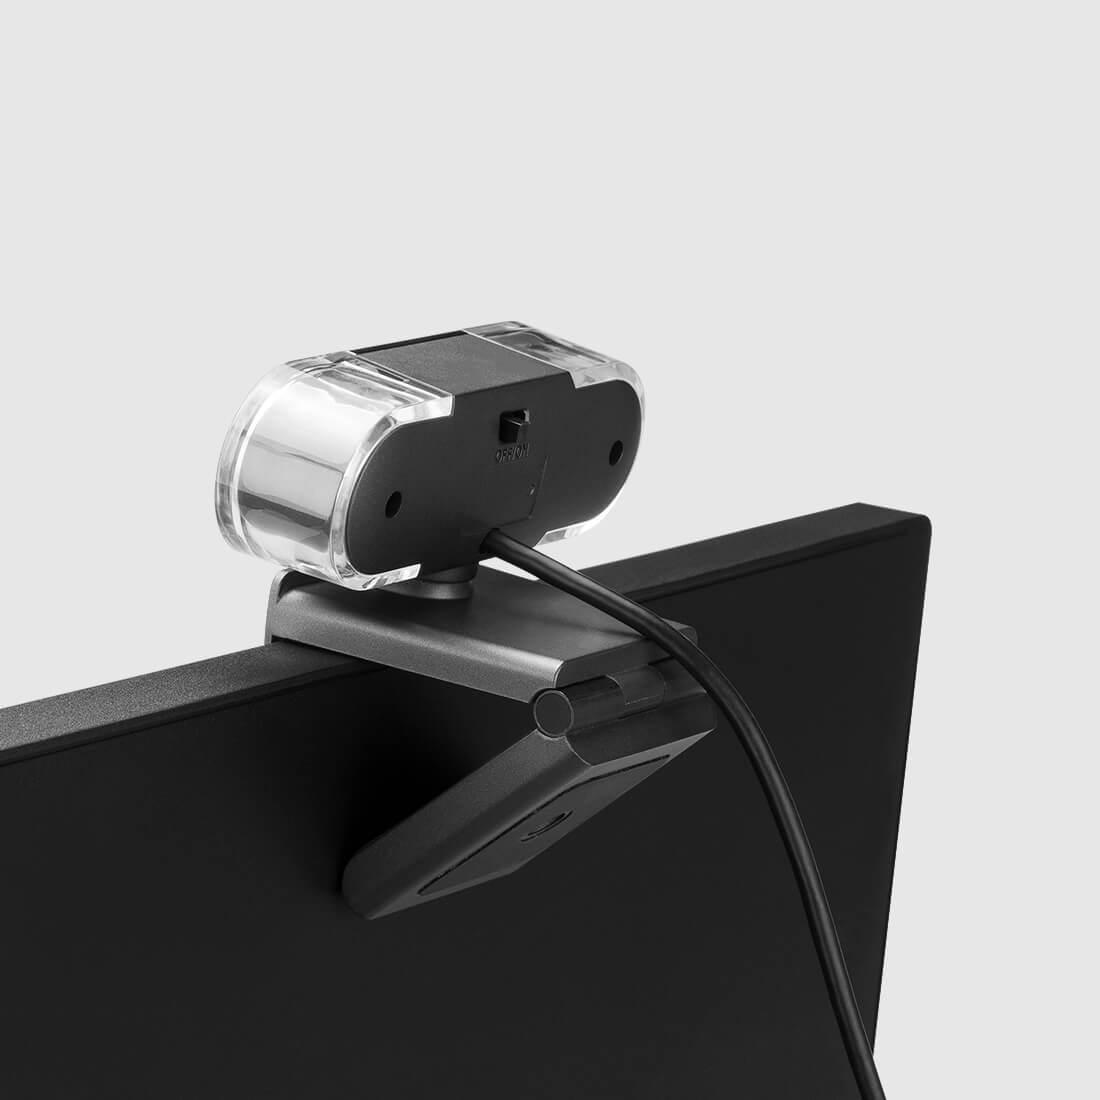 USB easy and quick setup